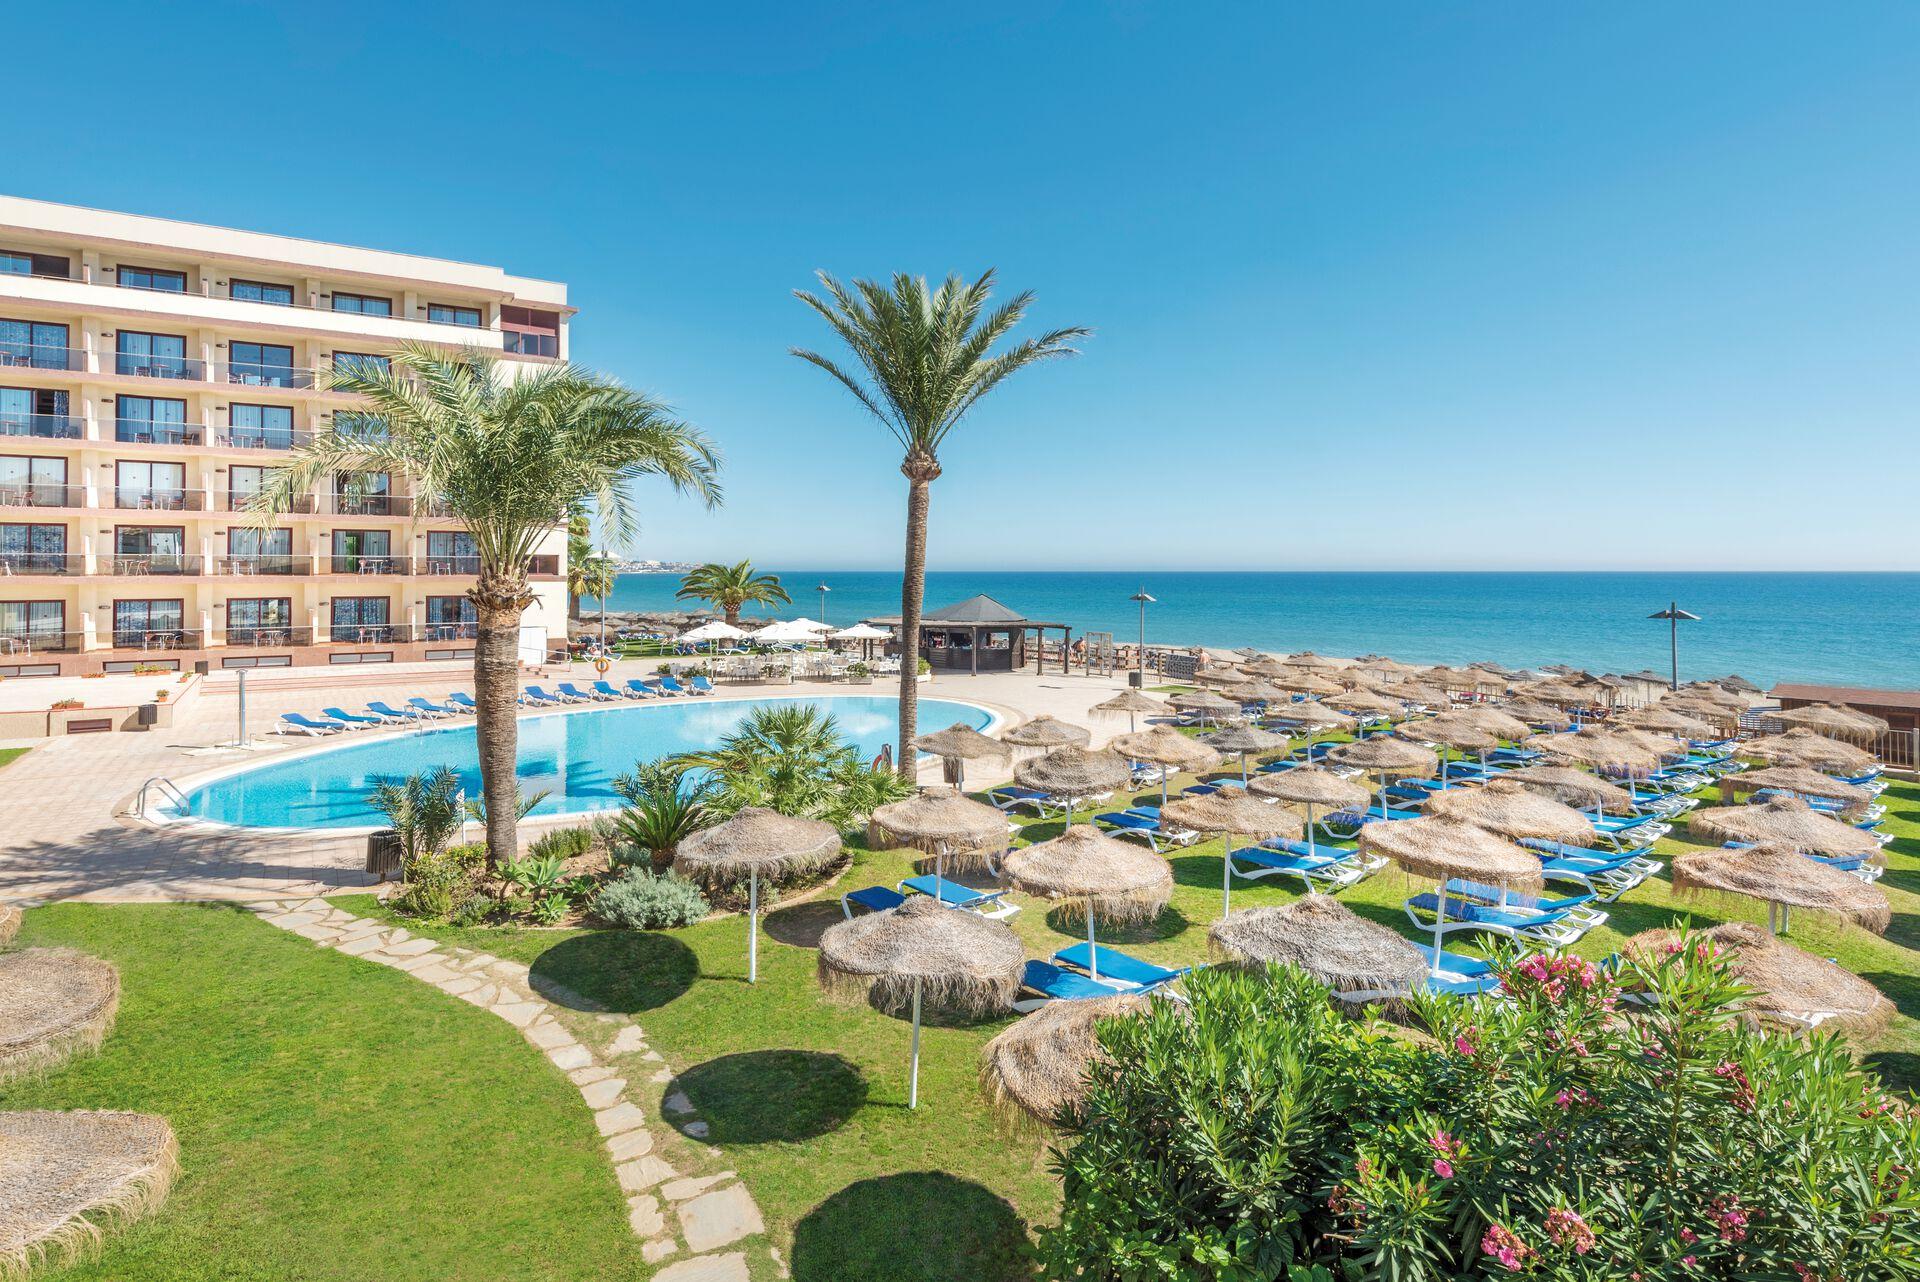 Vik Gran Hotel Costa del Sol 9*, Malaga, Andalousie, Espagne avec